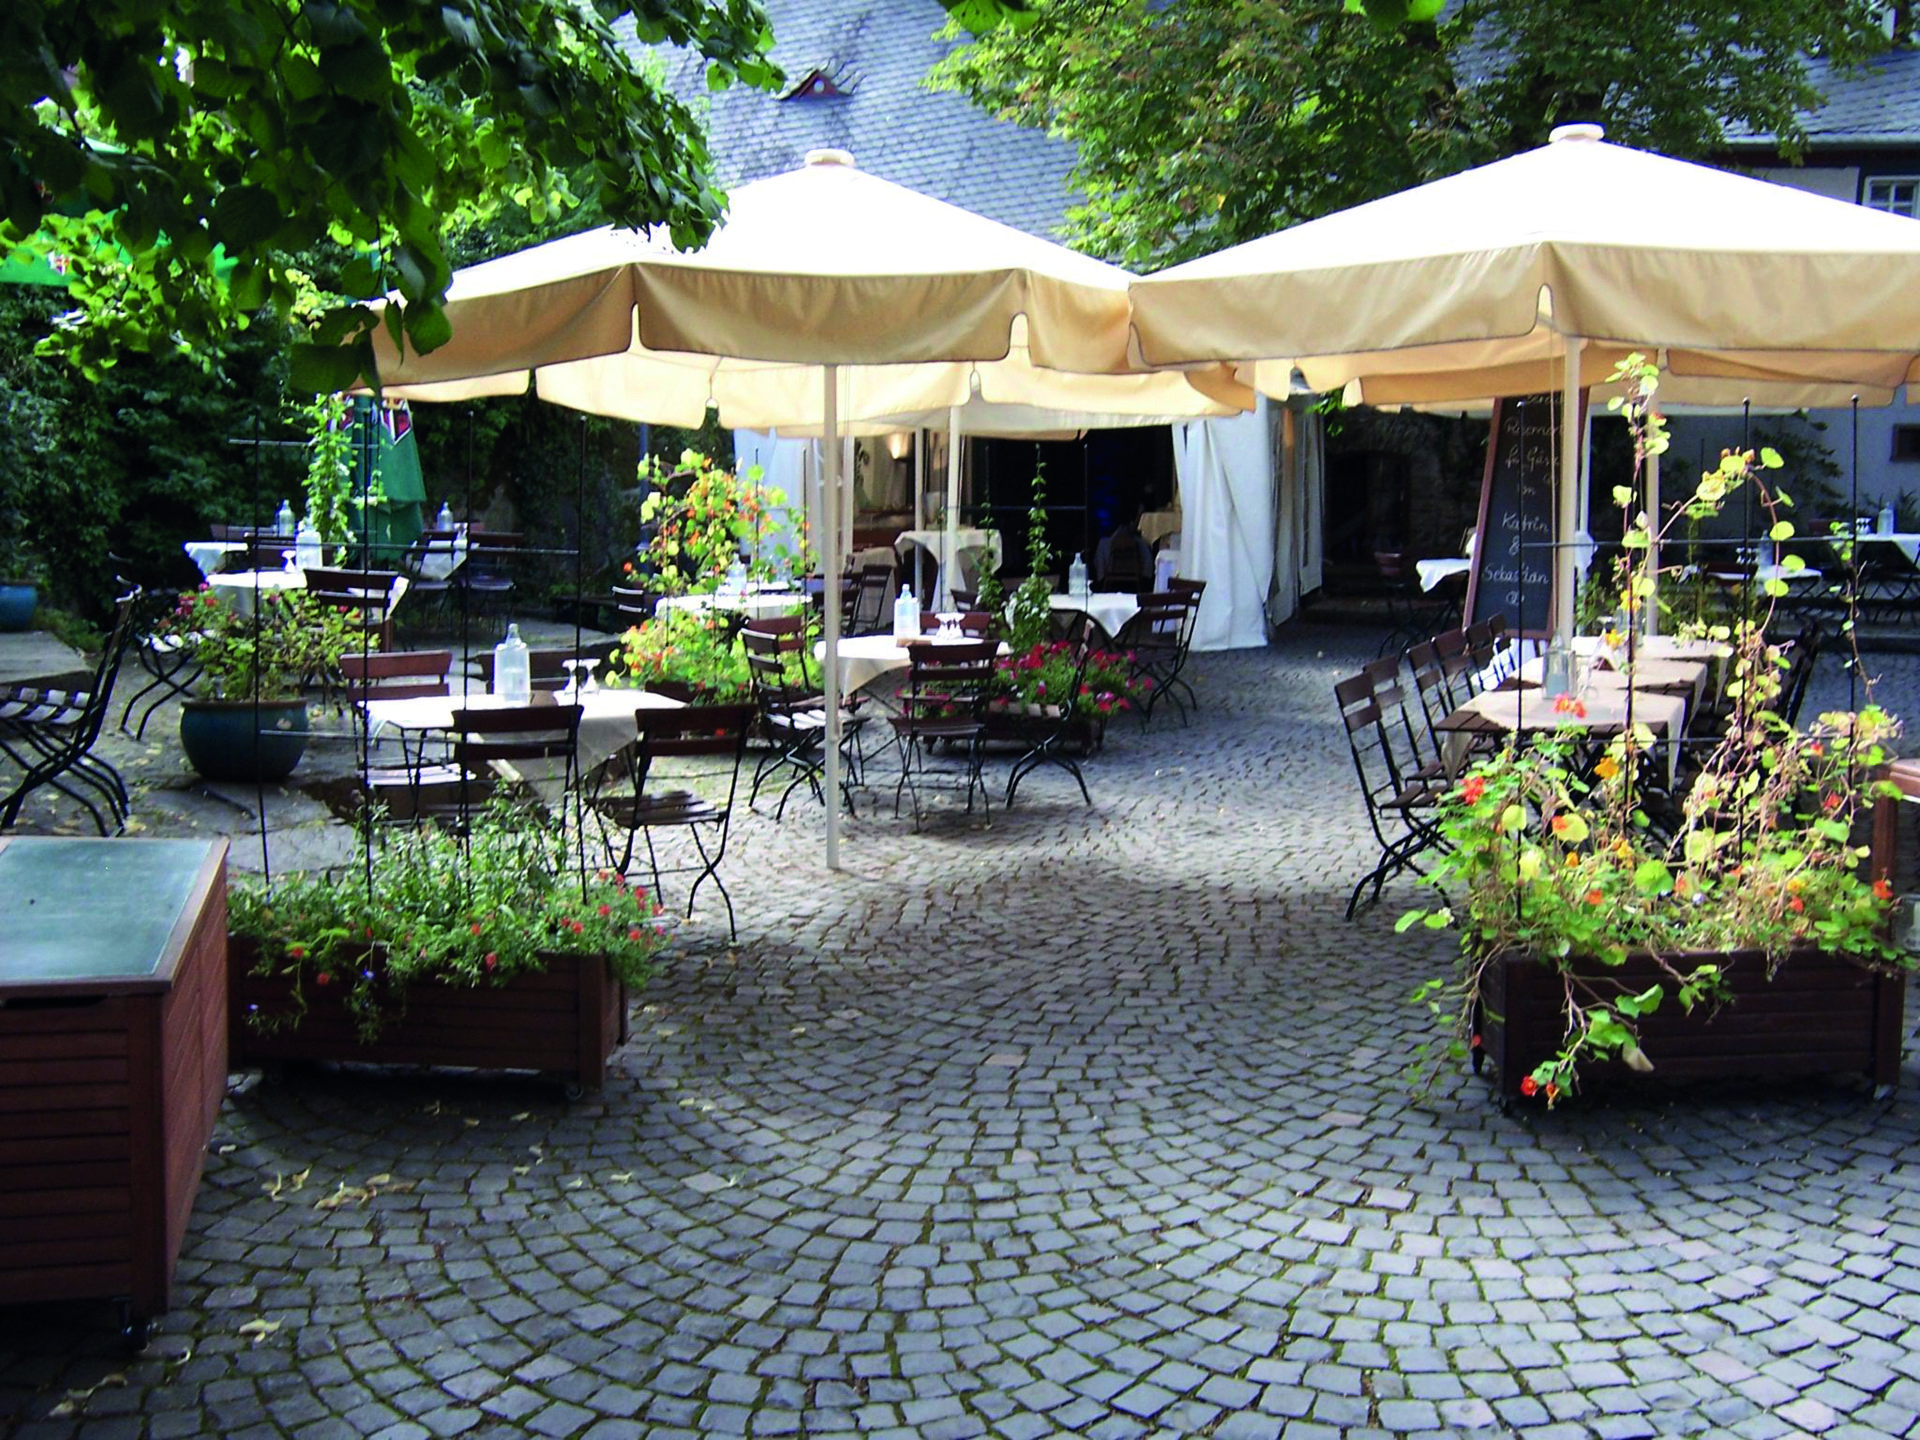 Badische Amtskellerey Biergarten